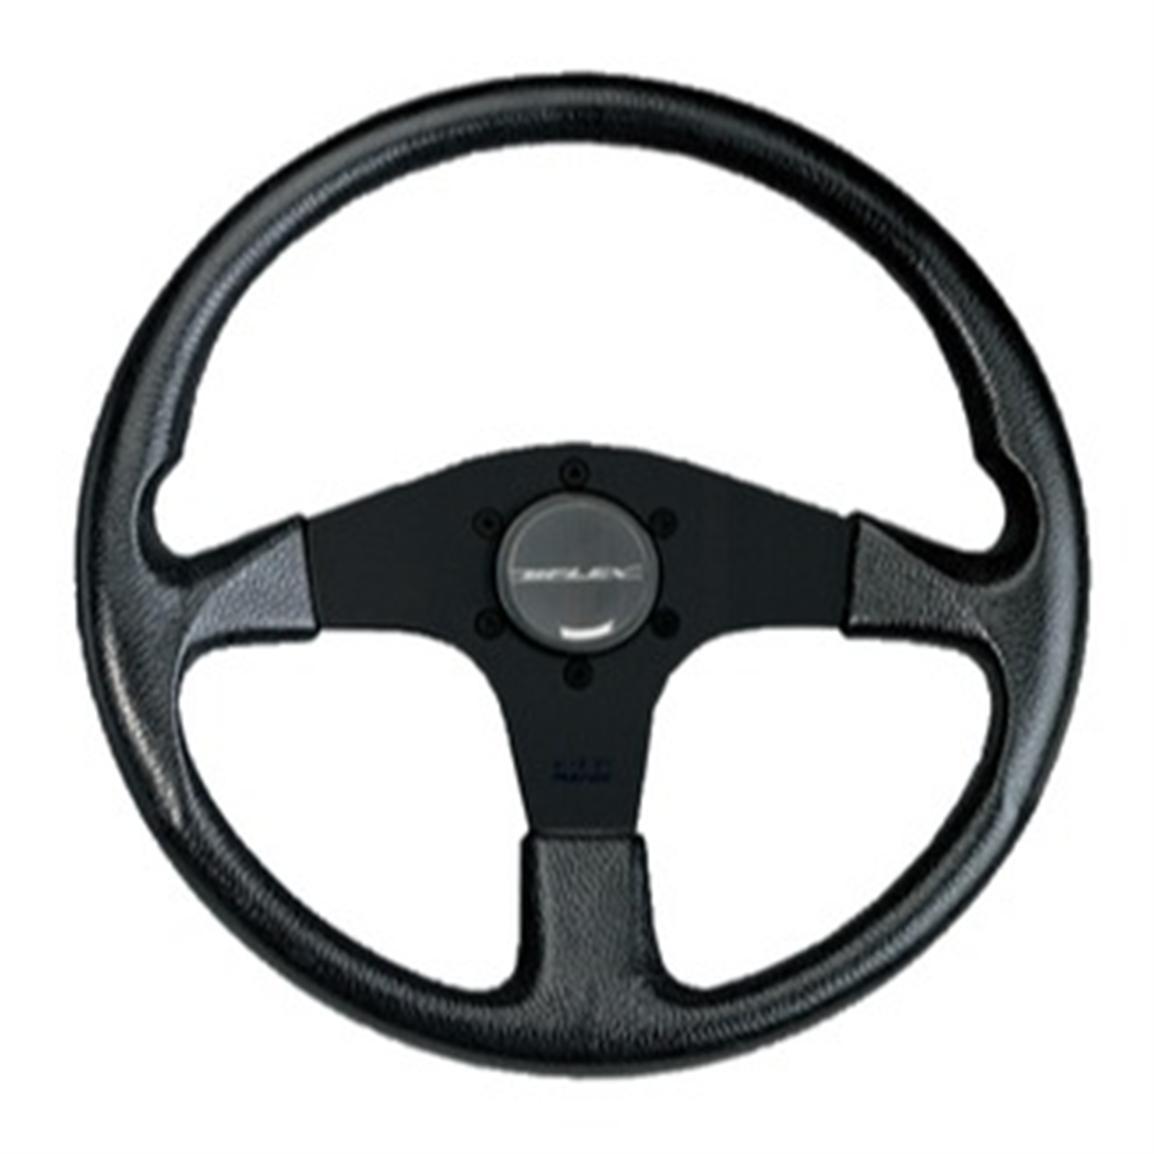 hight resolution of steering wheel clipart